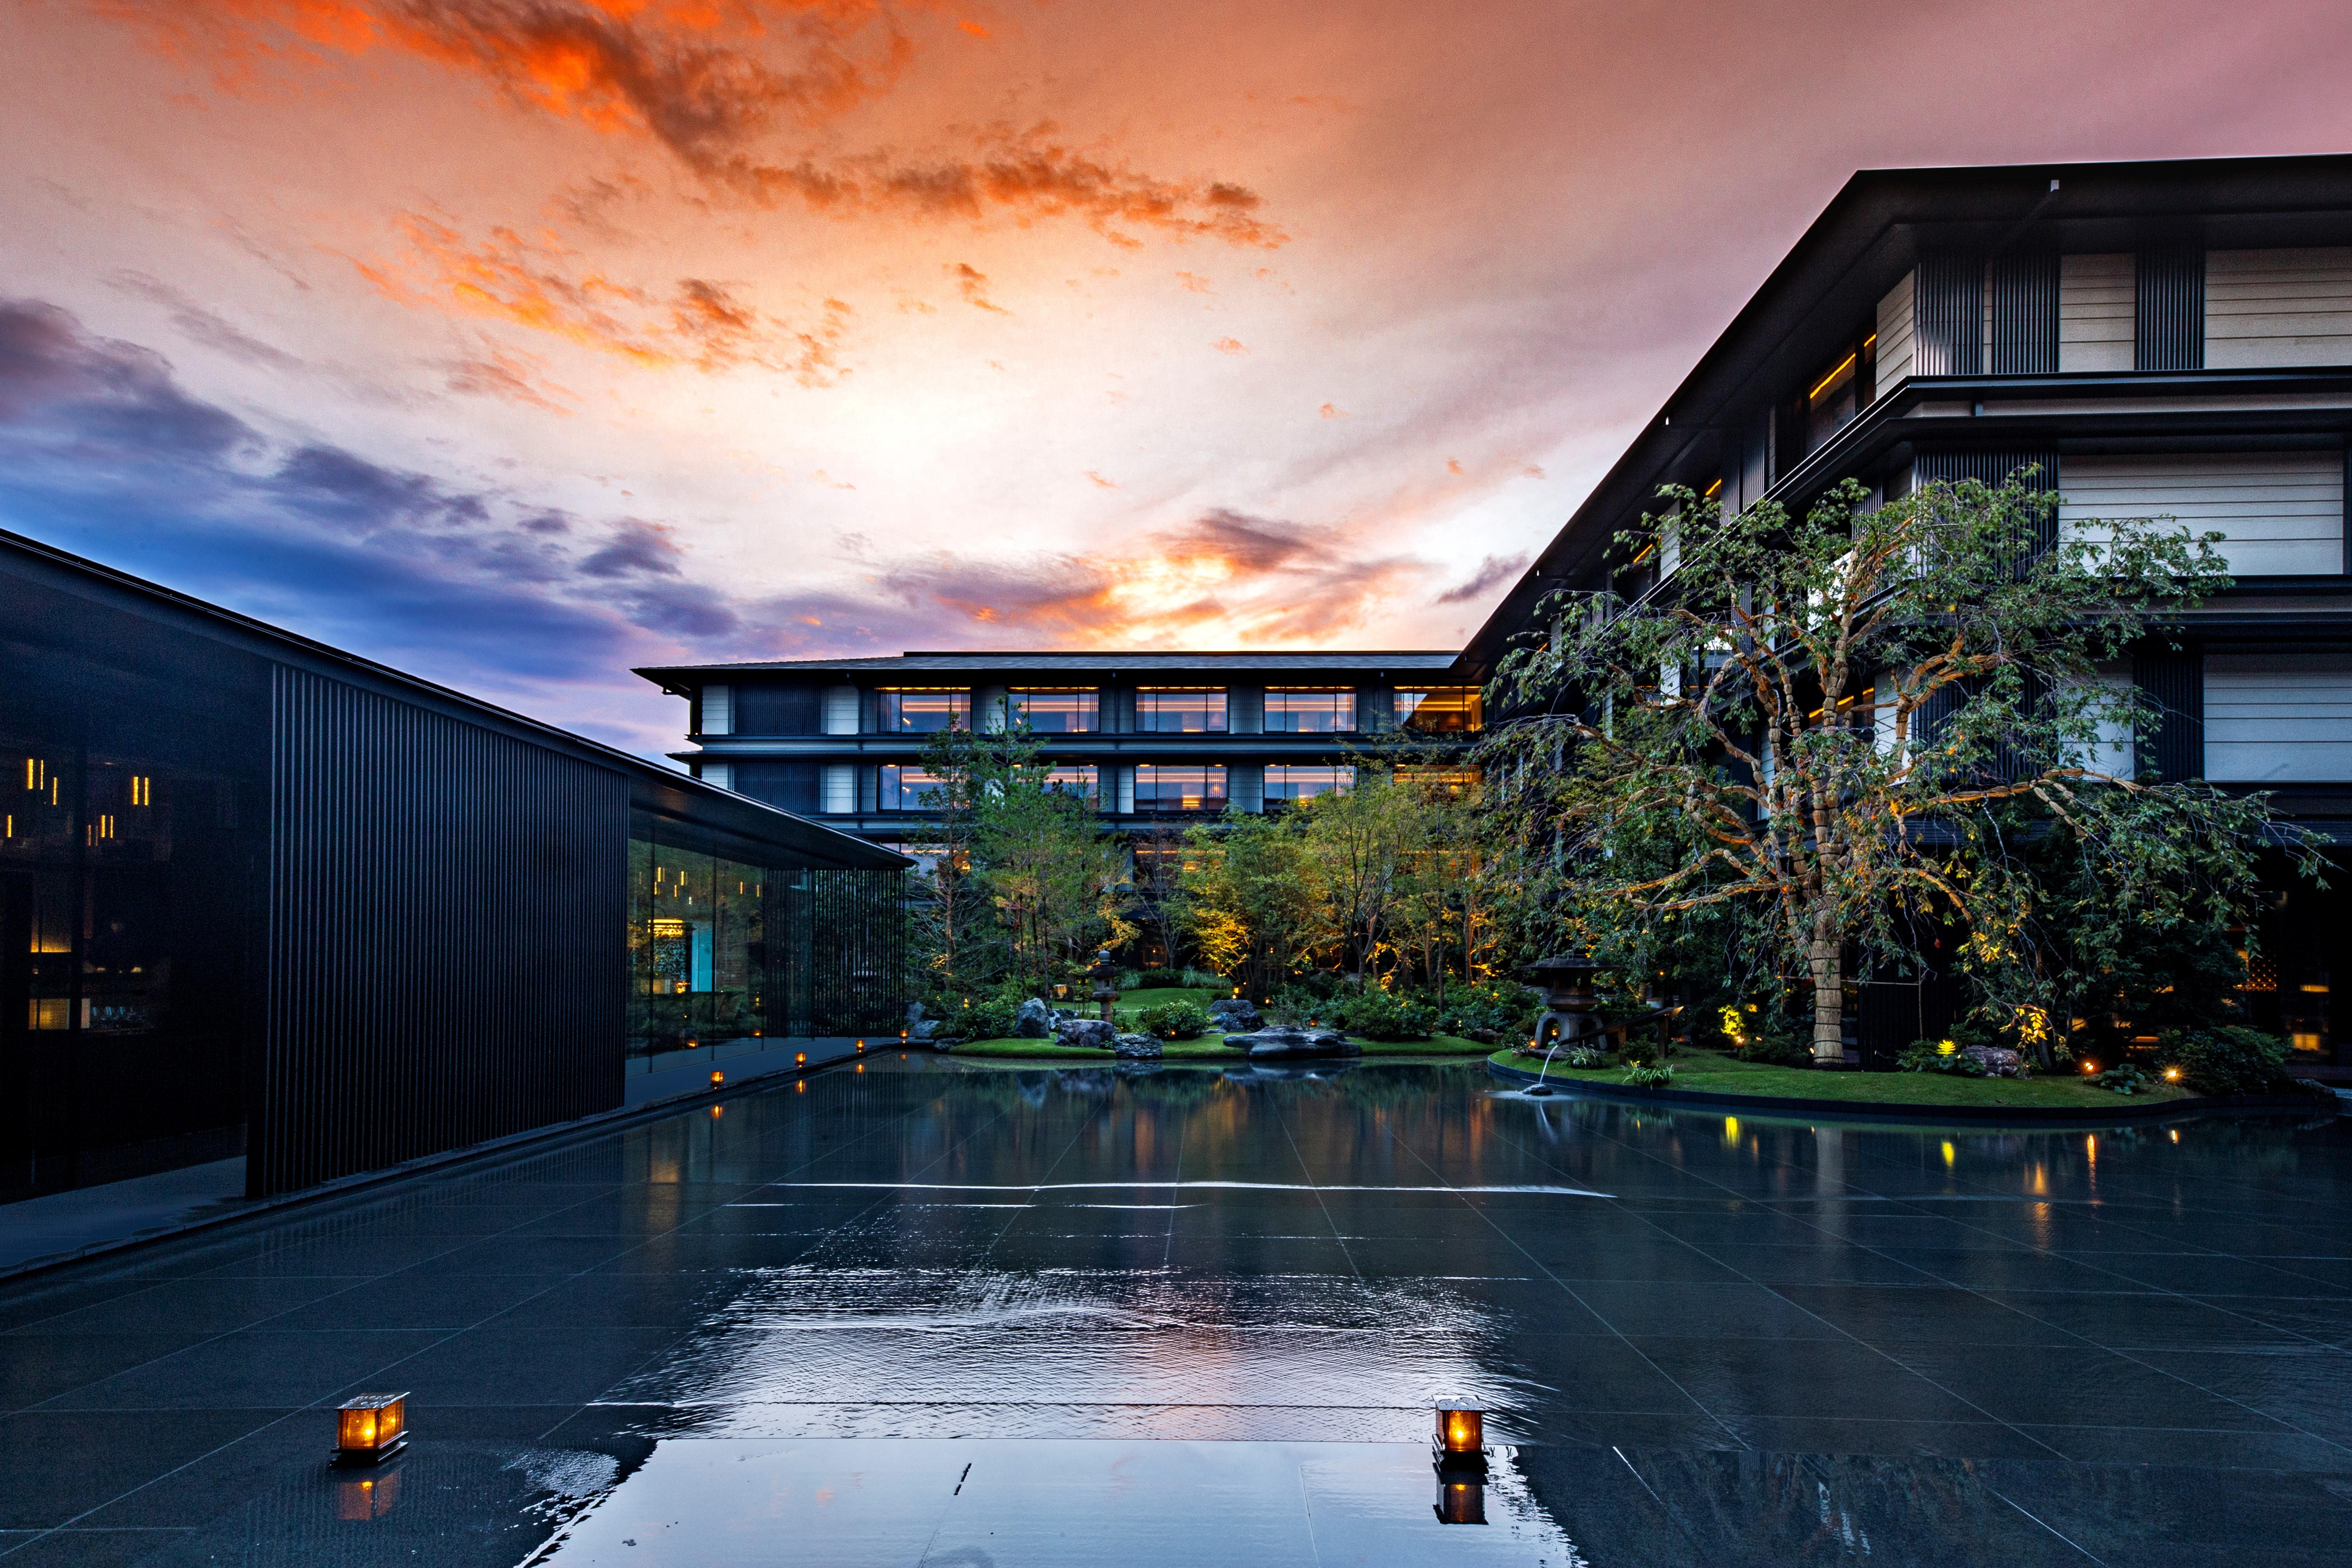 「HOTEL THE MITSUI KYOTO」2021年度グッドデザイン賞受賞